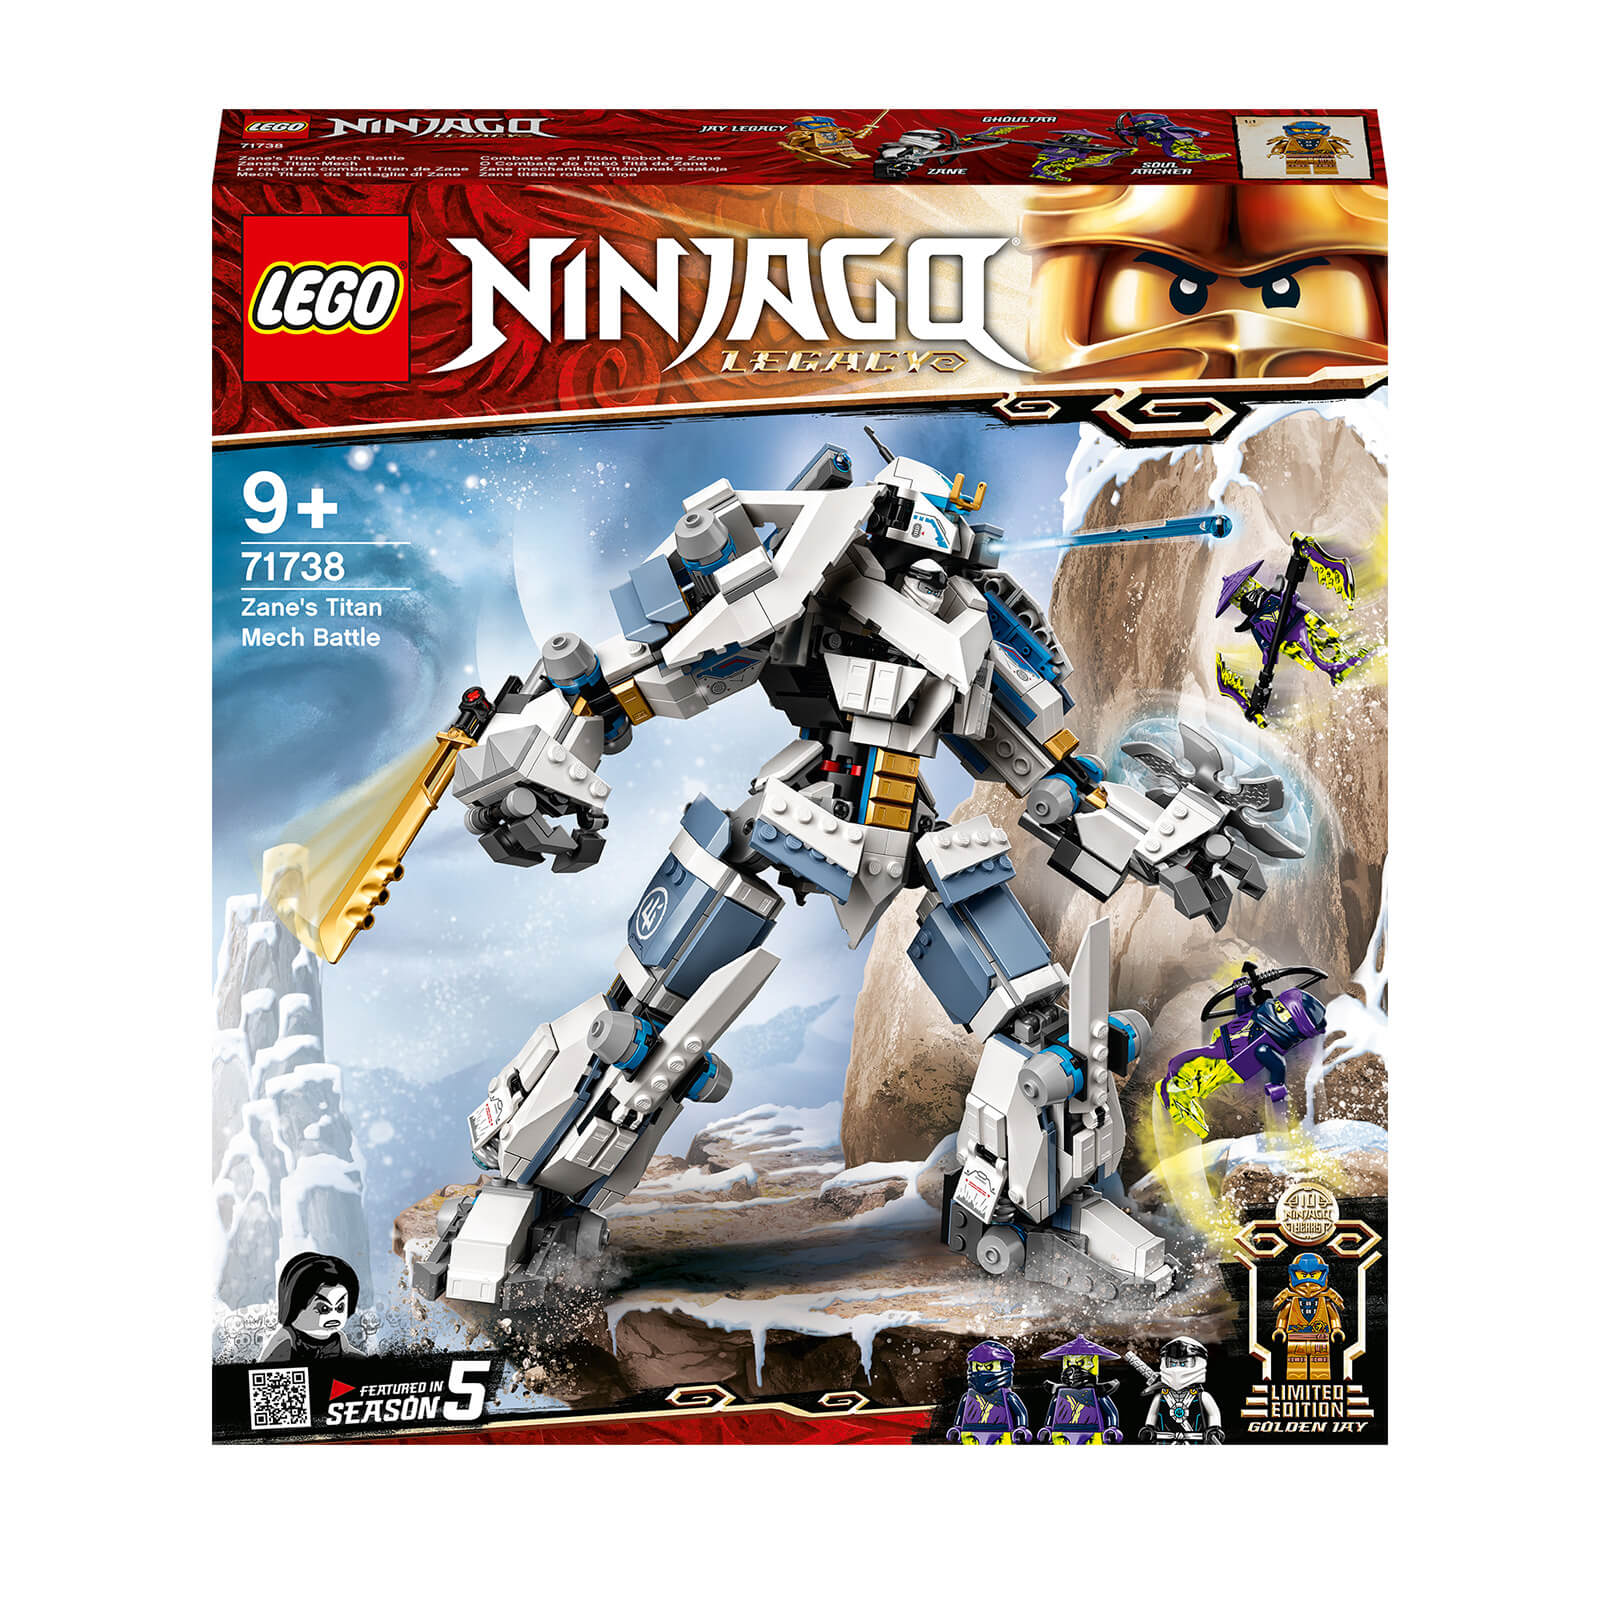 Image of LEGO NINJAGO: Legacy Zane's Titan Mech Battle Toy (71738)